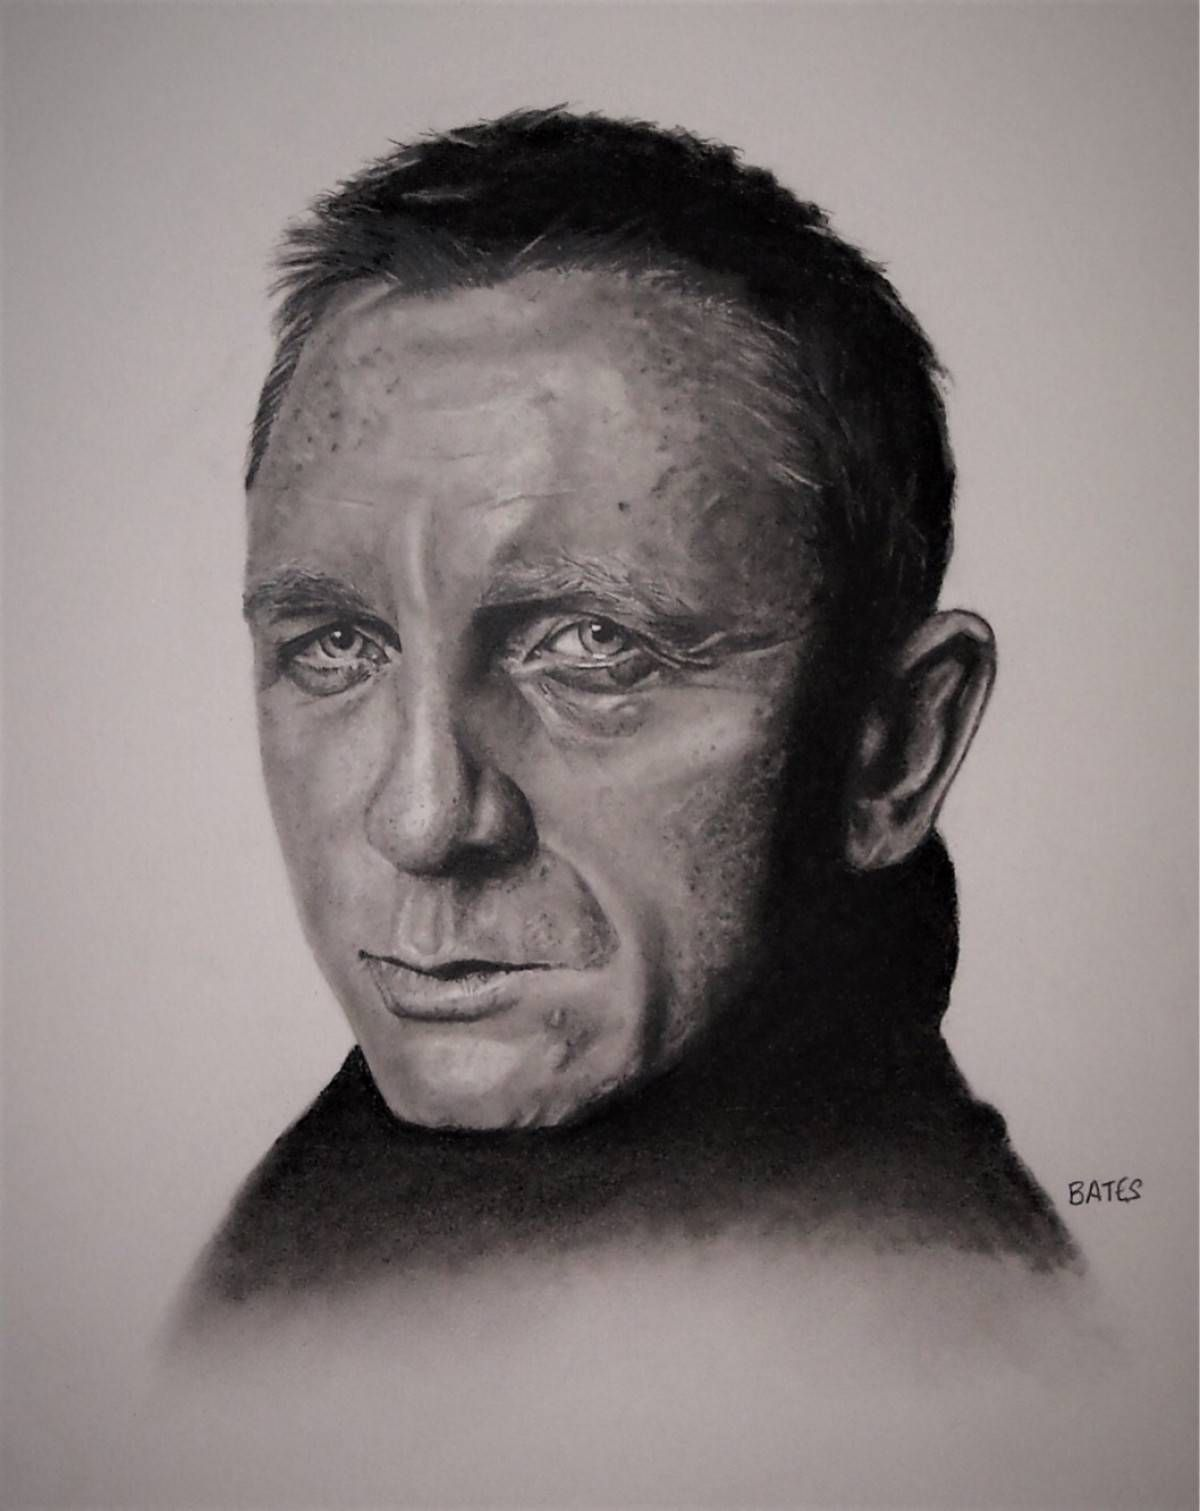 This amazing pencil portrait was drawn by talented artist david bates danielcraig jamesbond007 jamesbond 007 portraits pencilportraits